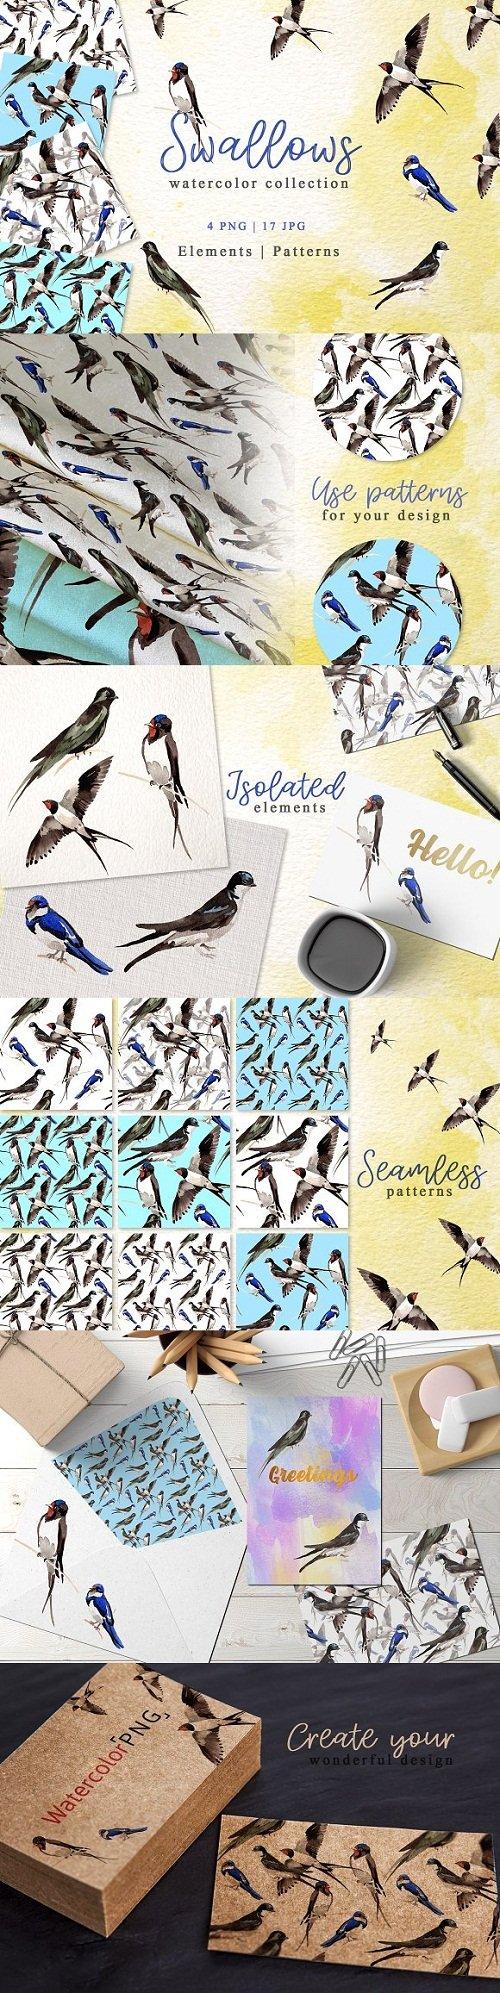 Swallows Watercolor png - 3415554